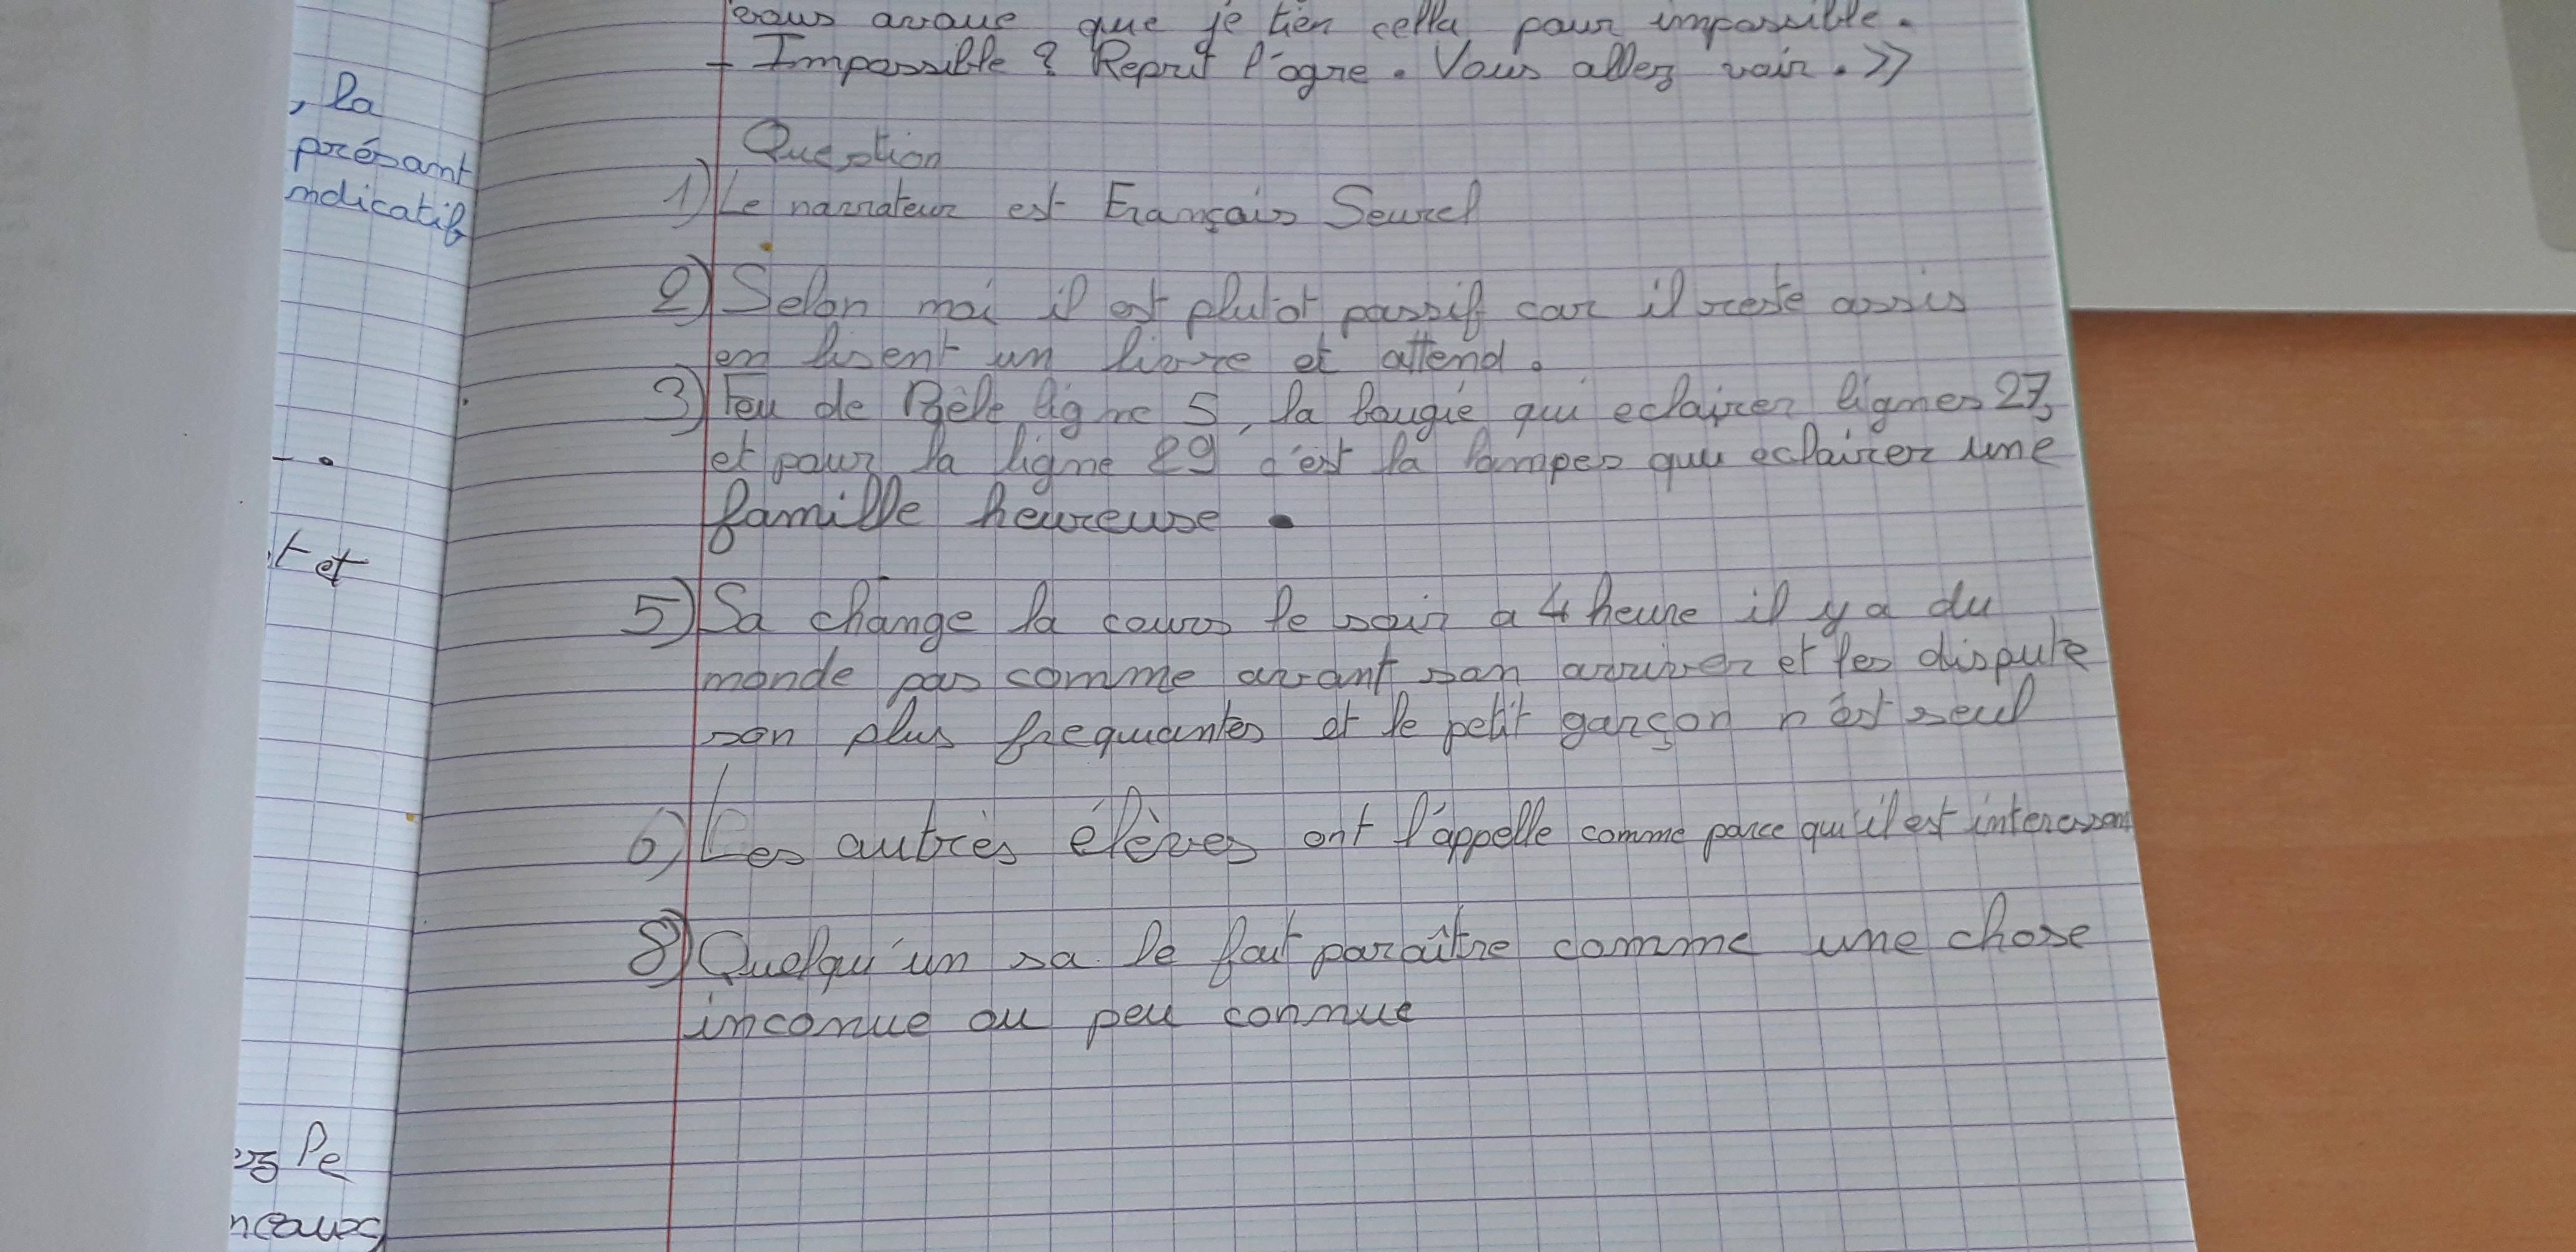 image francais_Capucine_2603.jpg (1.5MB)